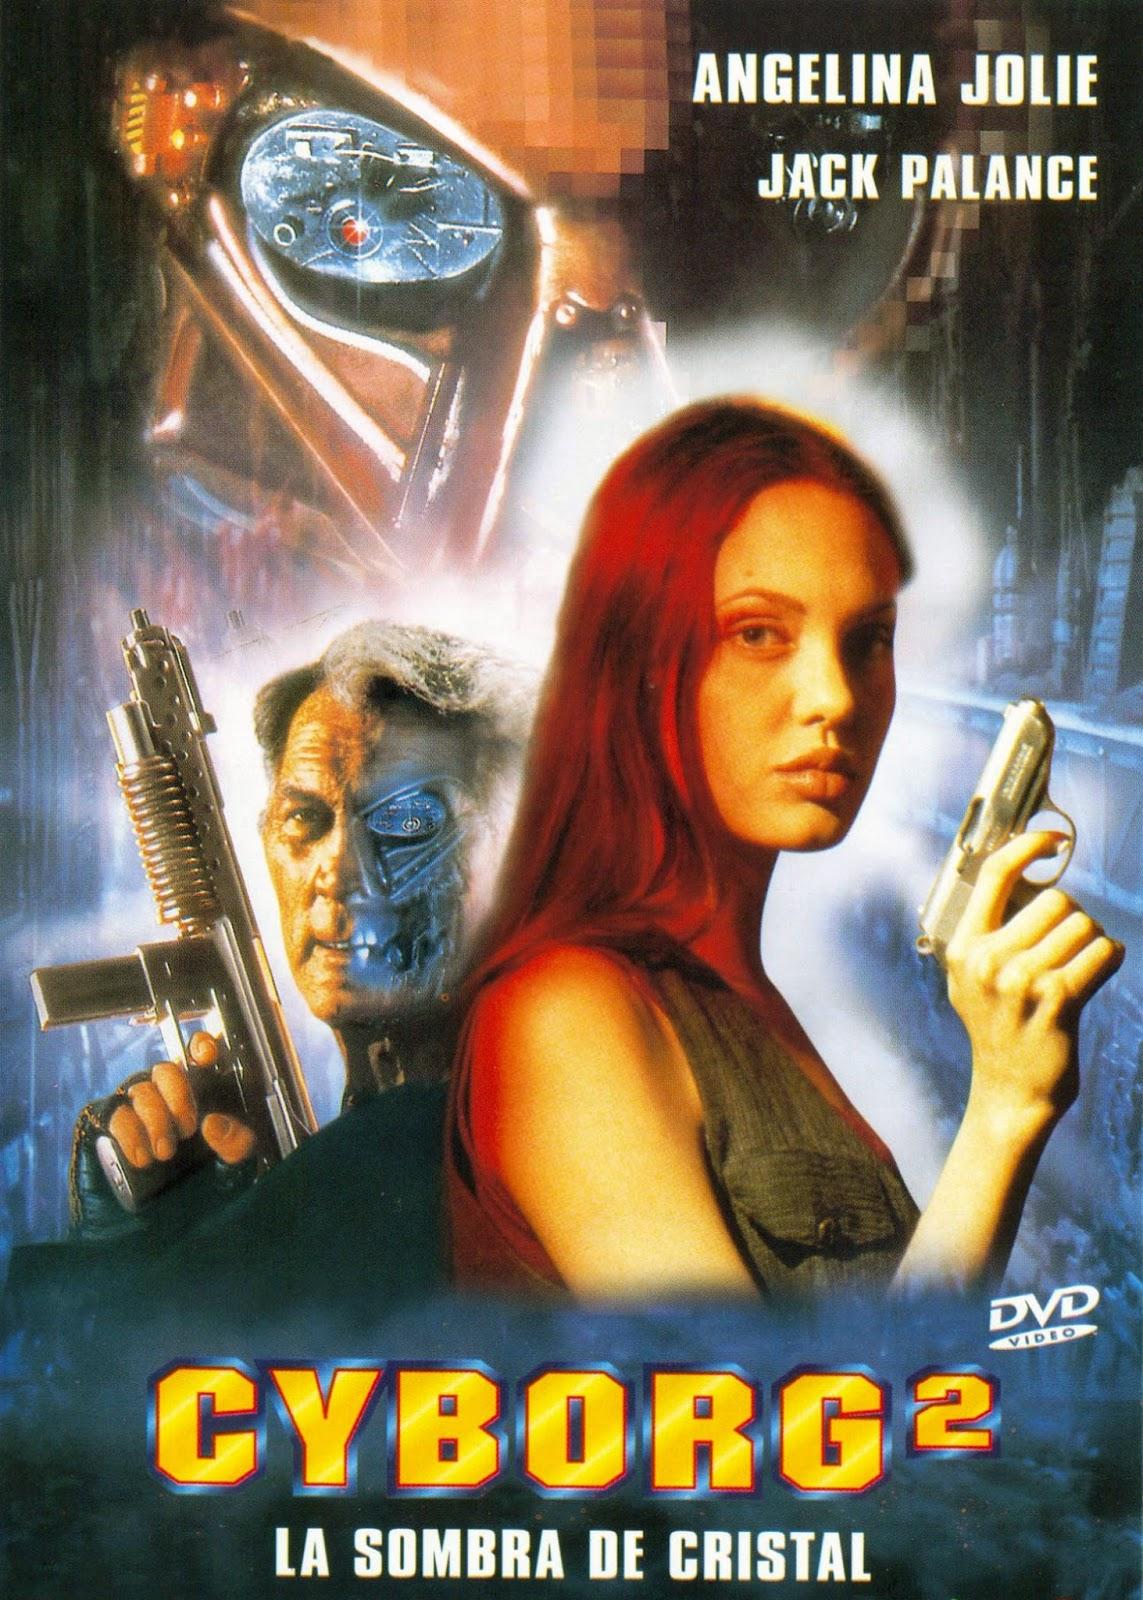 Cyborg 2 - La Sombra de Cristal (1993)